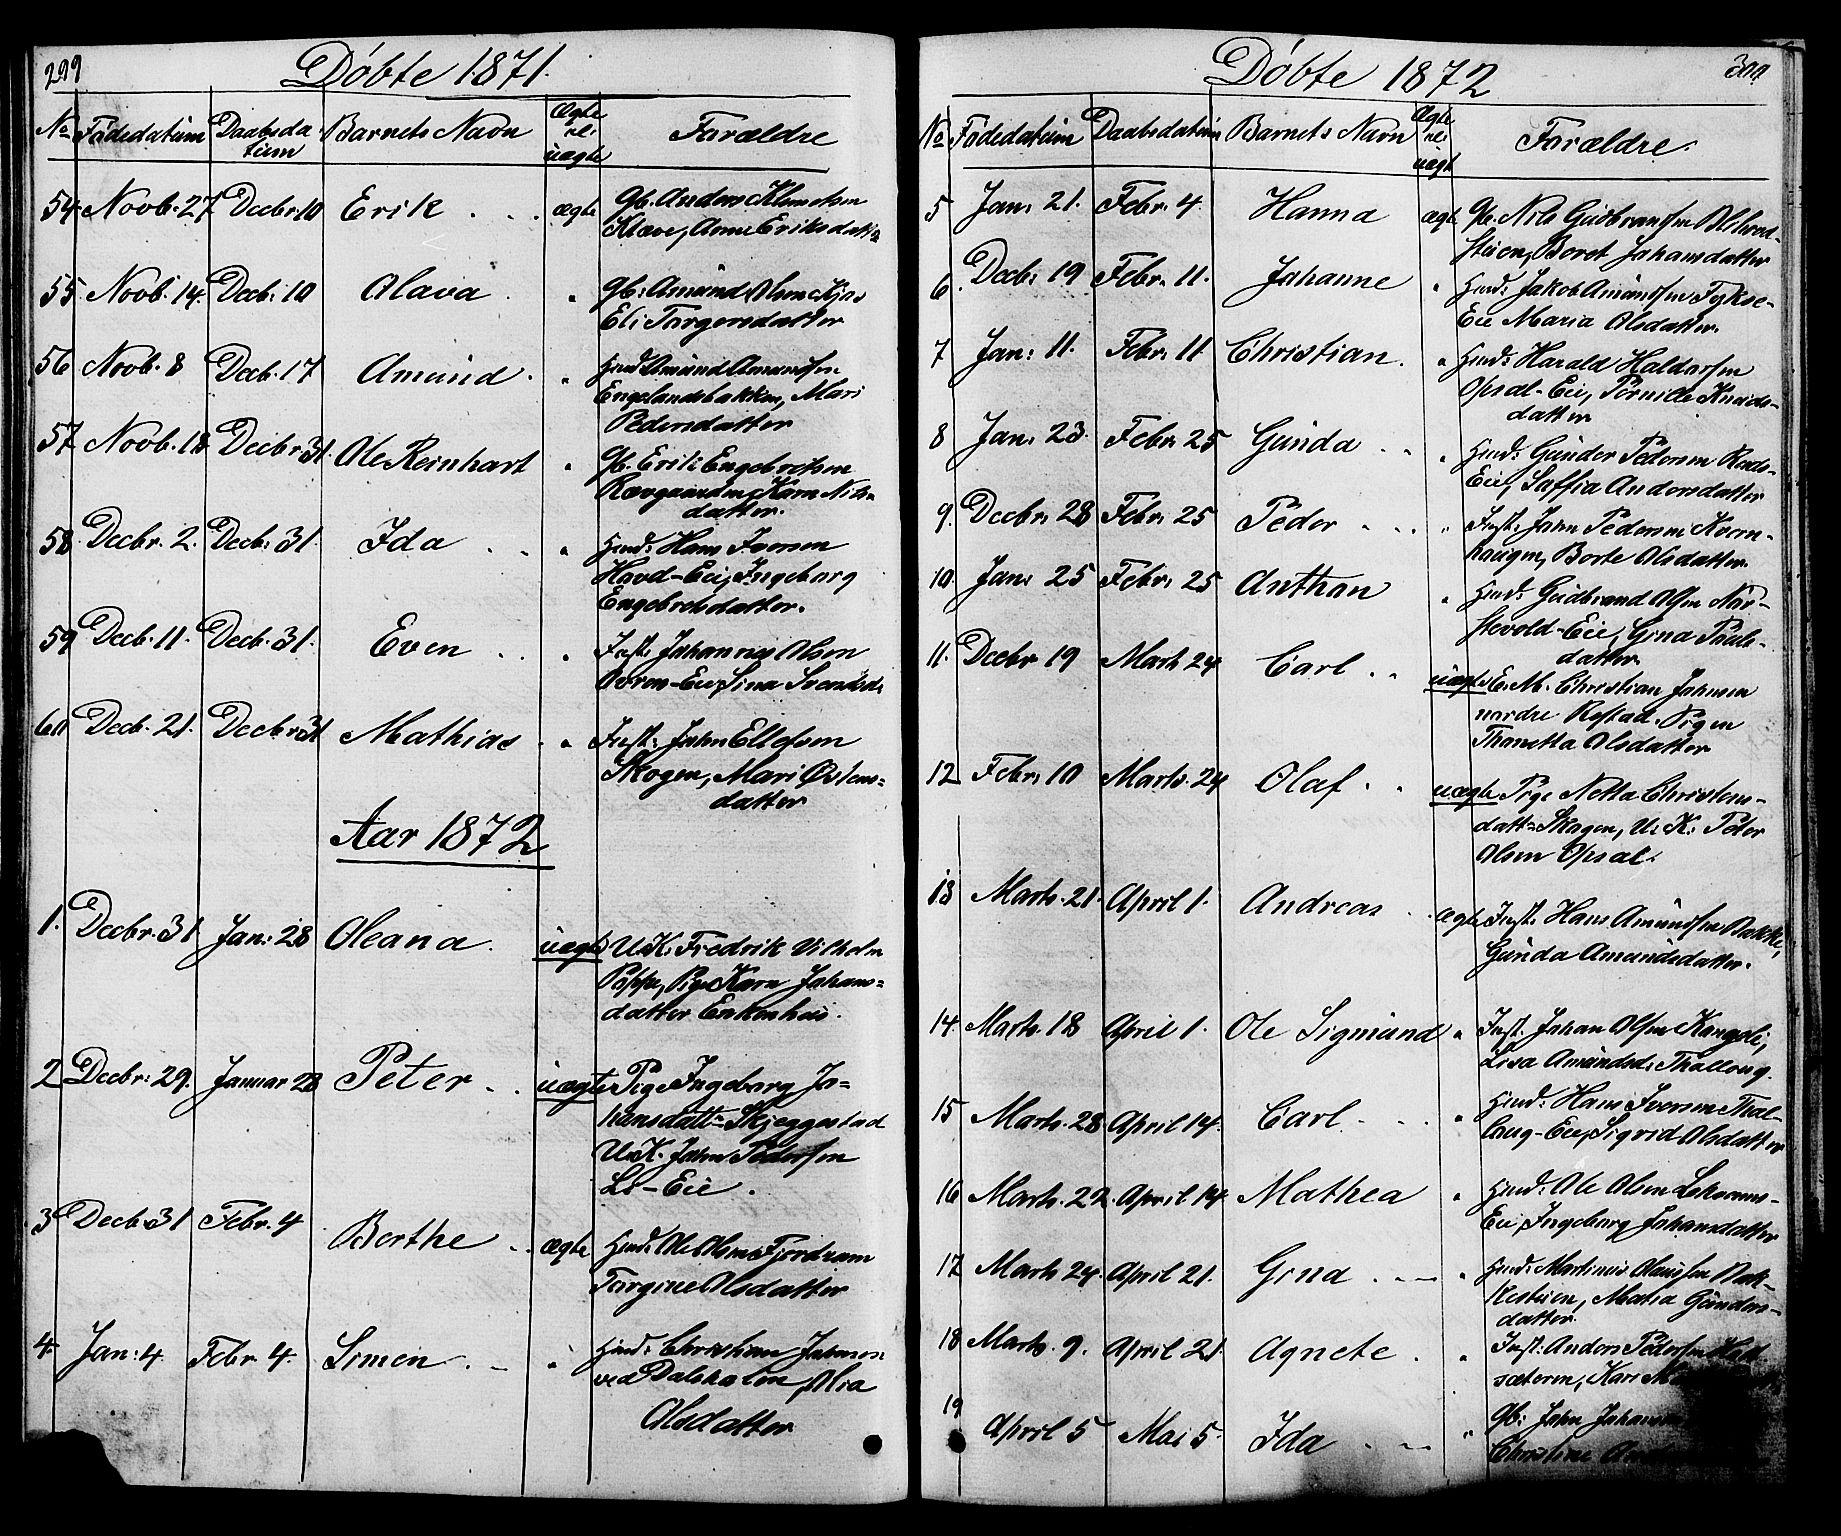 SAH, Østre Gausdal prestekontor, Klokkerbok nr. 1, 1863-1893, s. 299-300